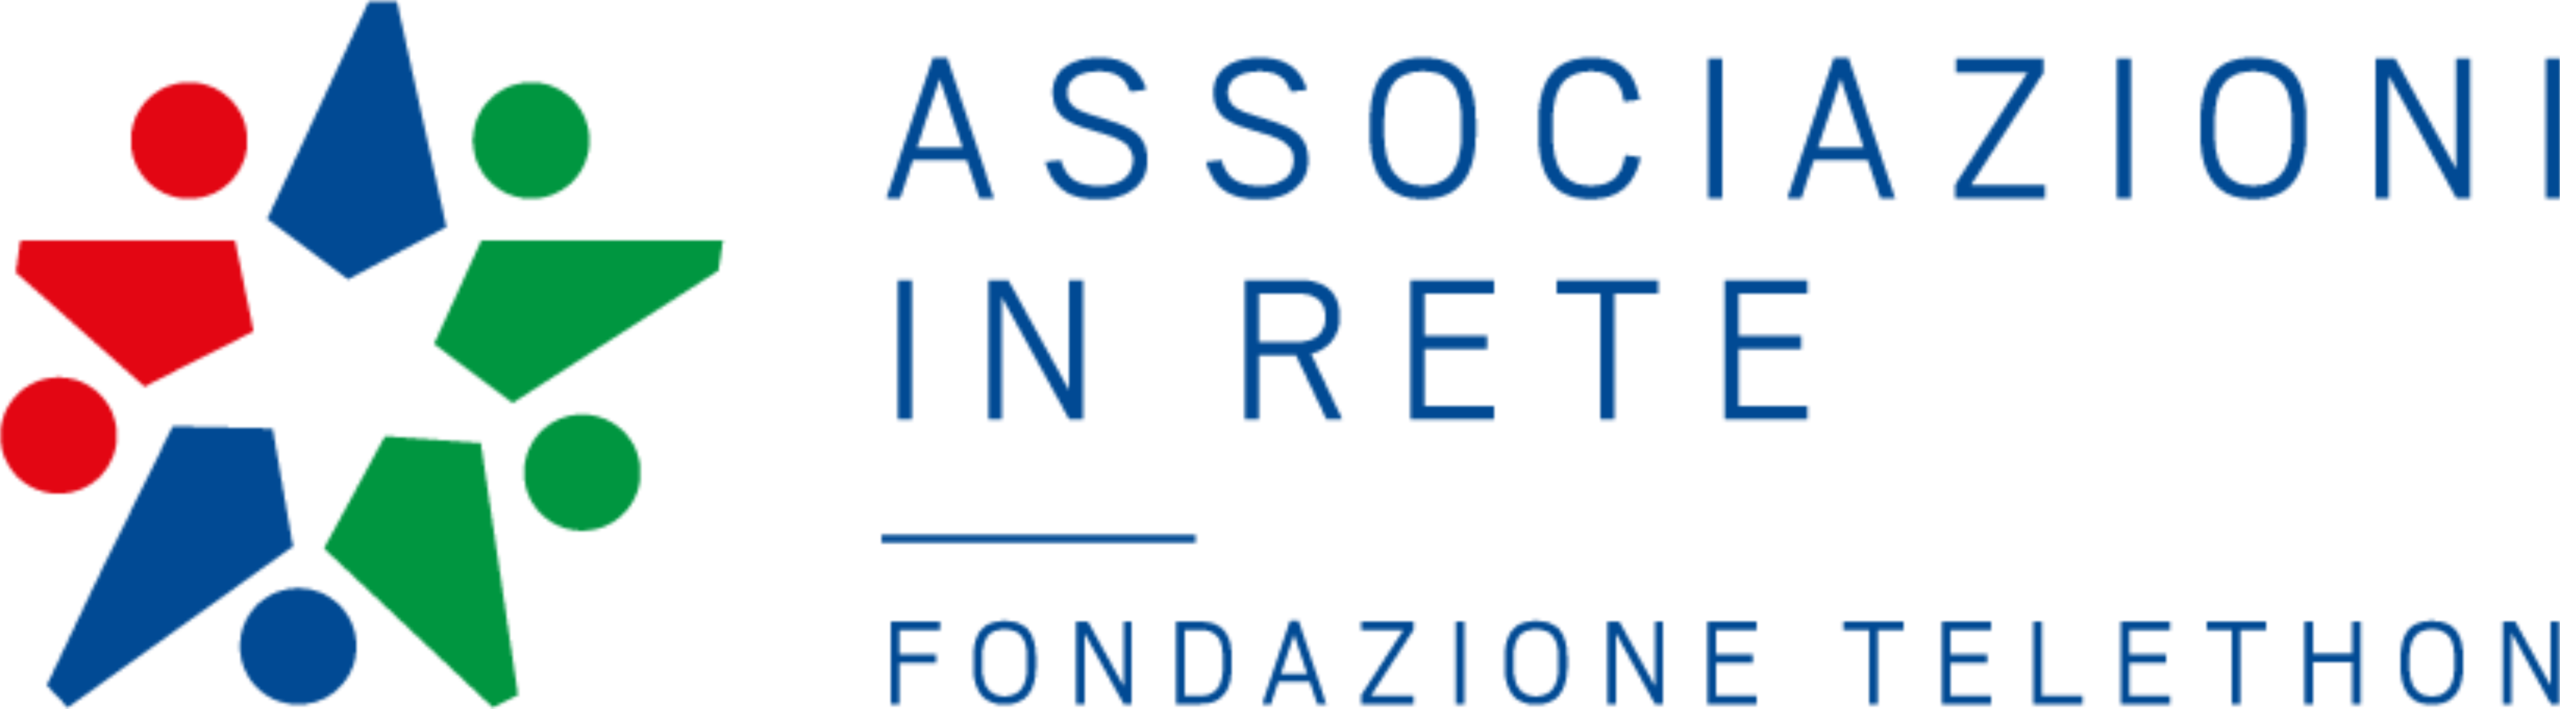 https://www.associazioneailu.org/AILU-WP/wp-content/uploads/2019/11/assretetelethon-scaled.png